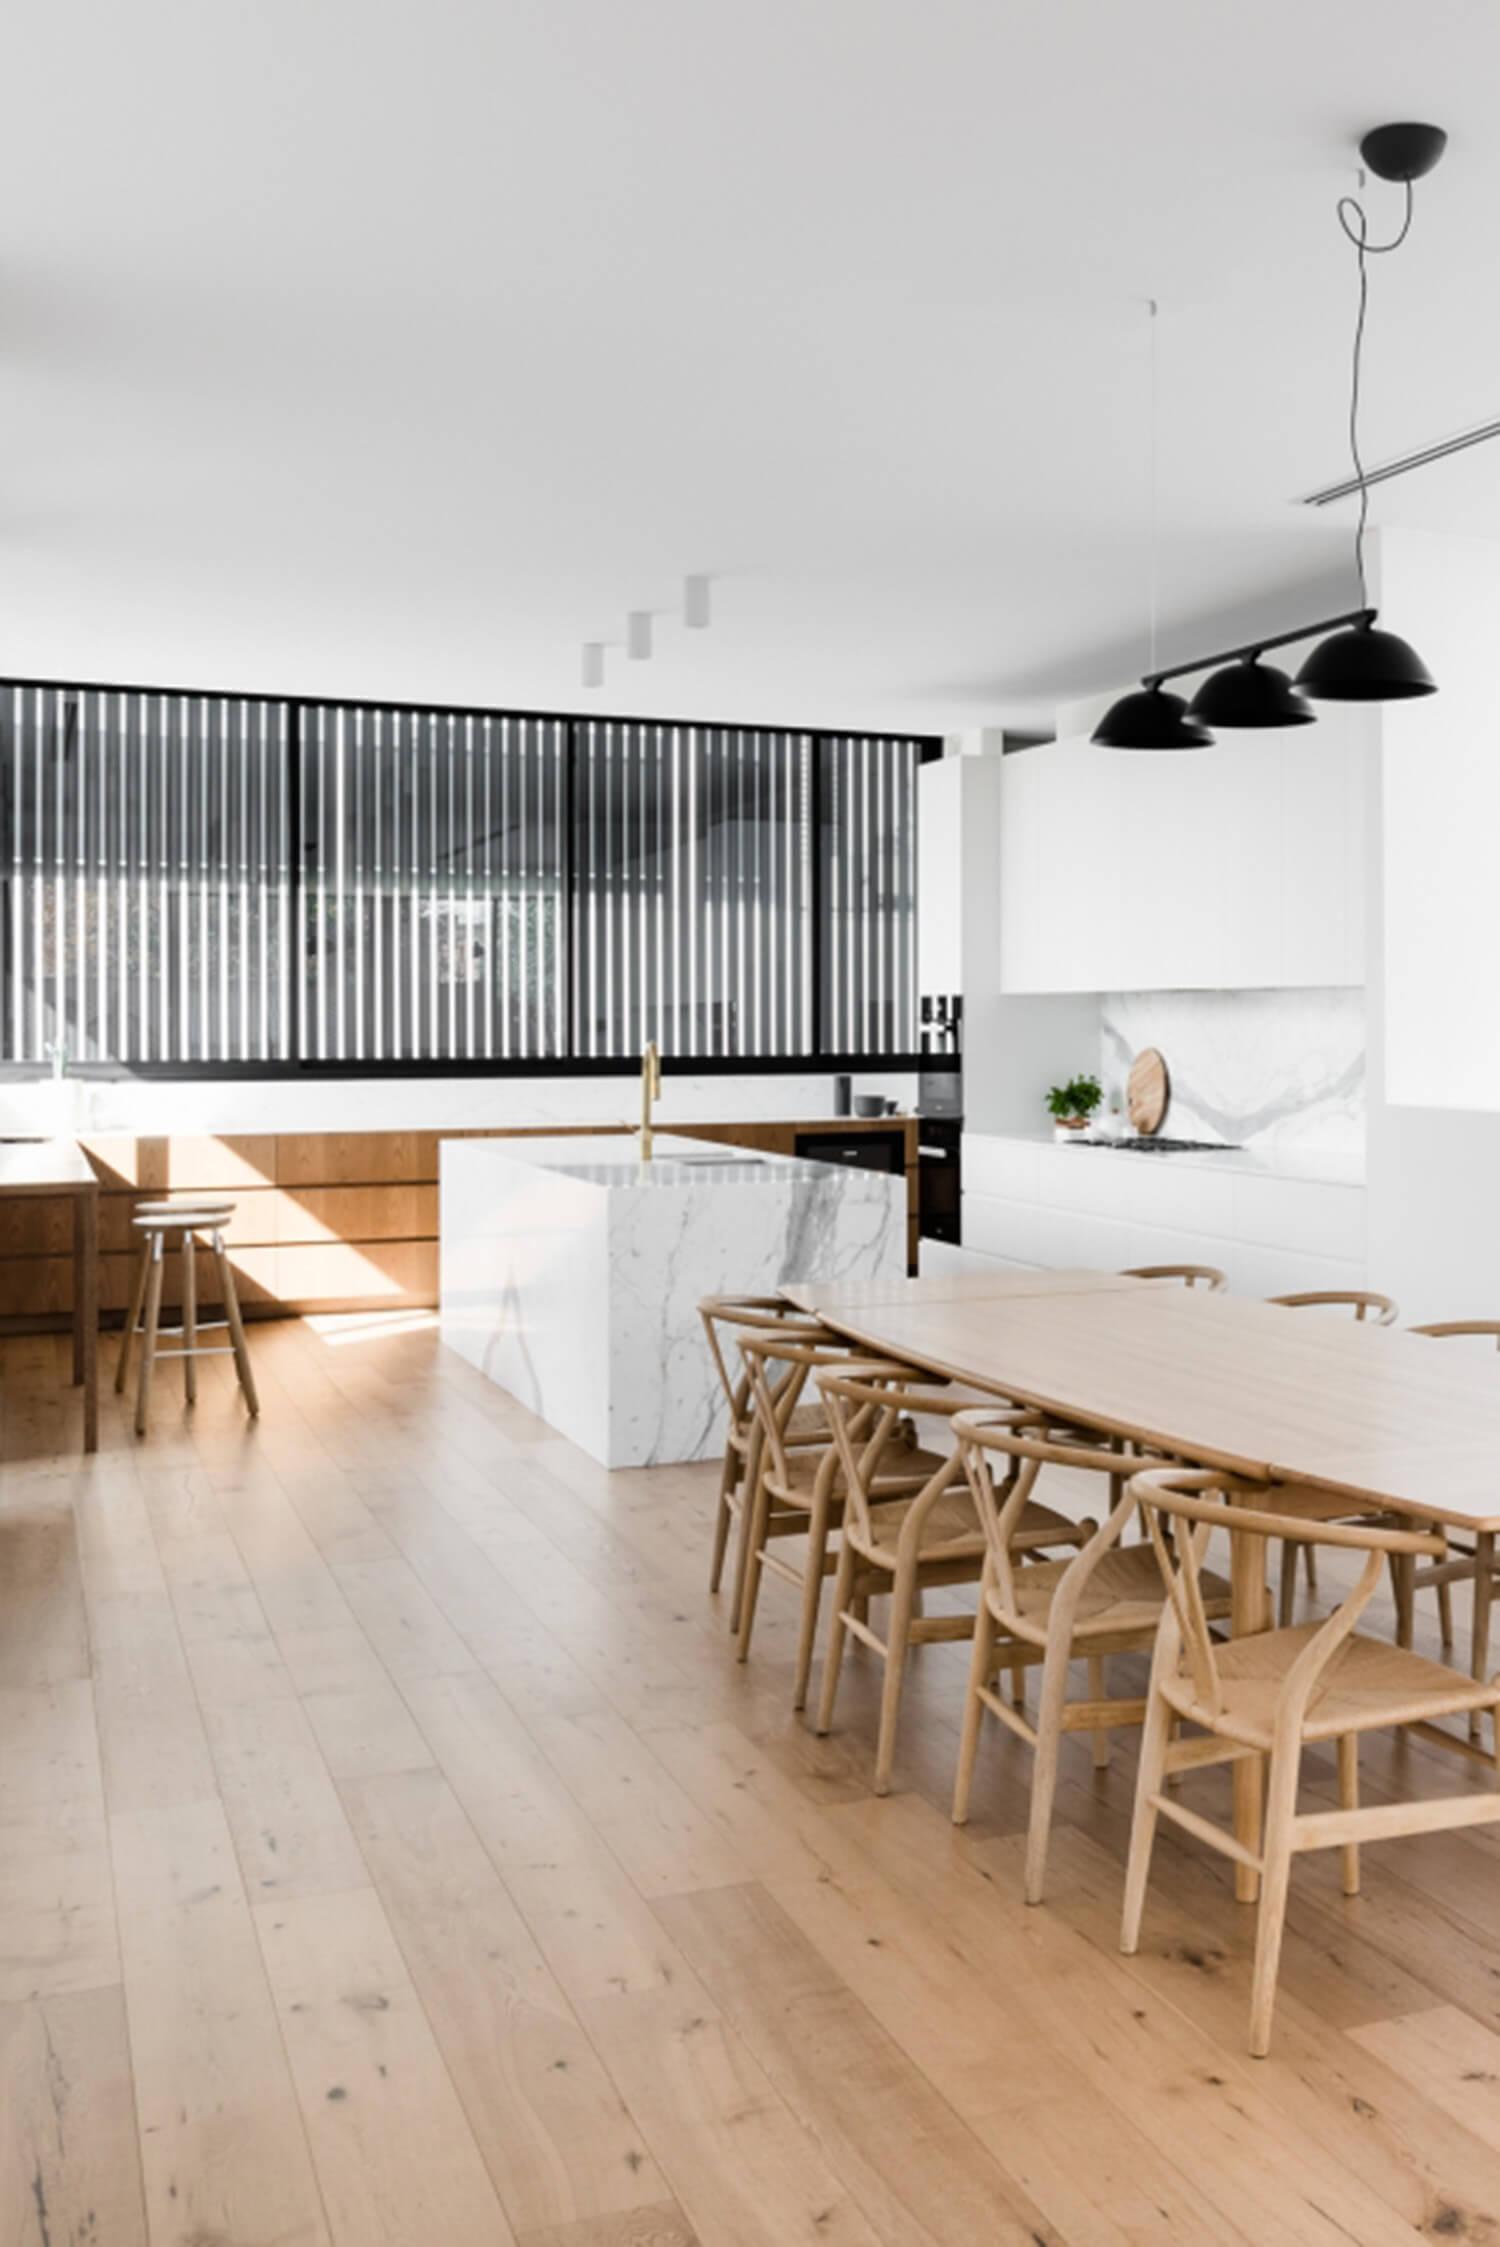 est living ha architects leveson street house.03